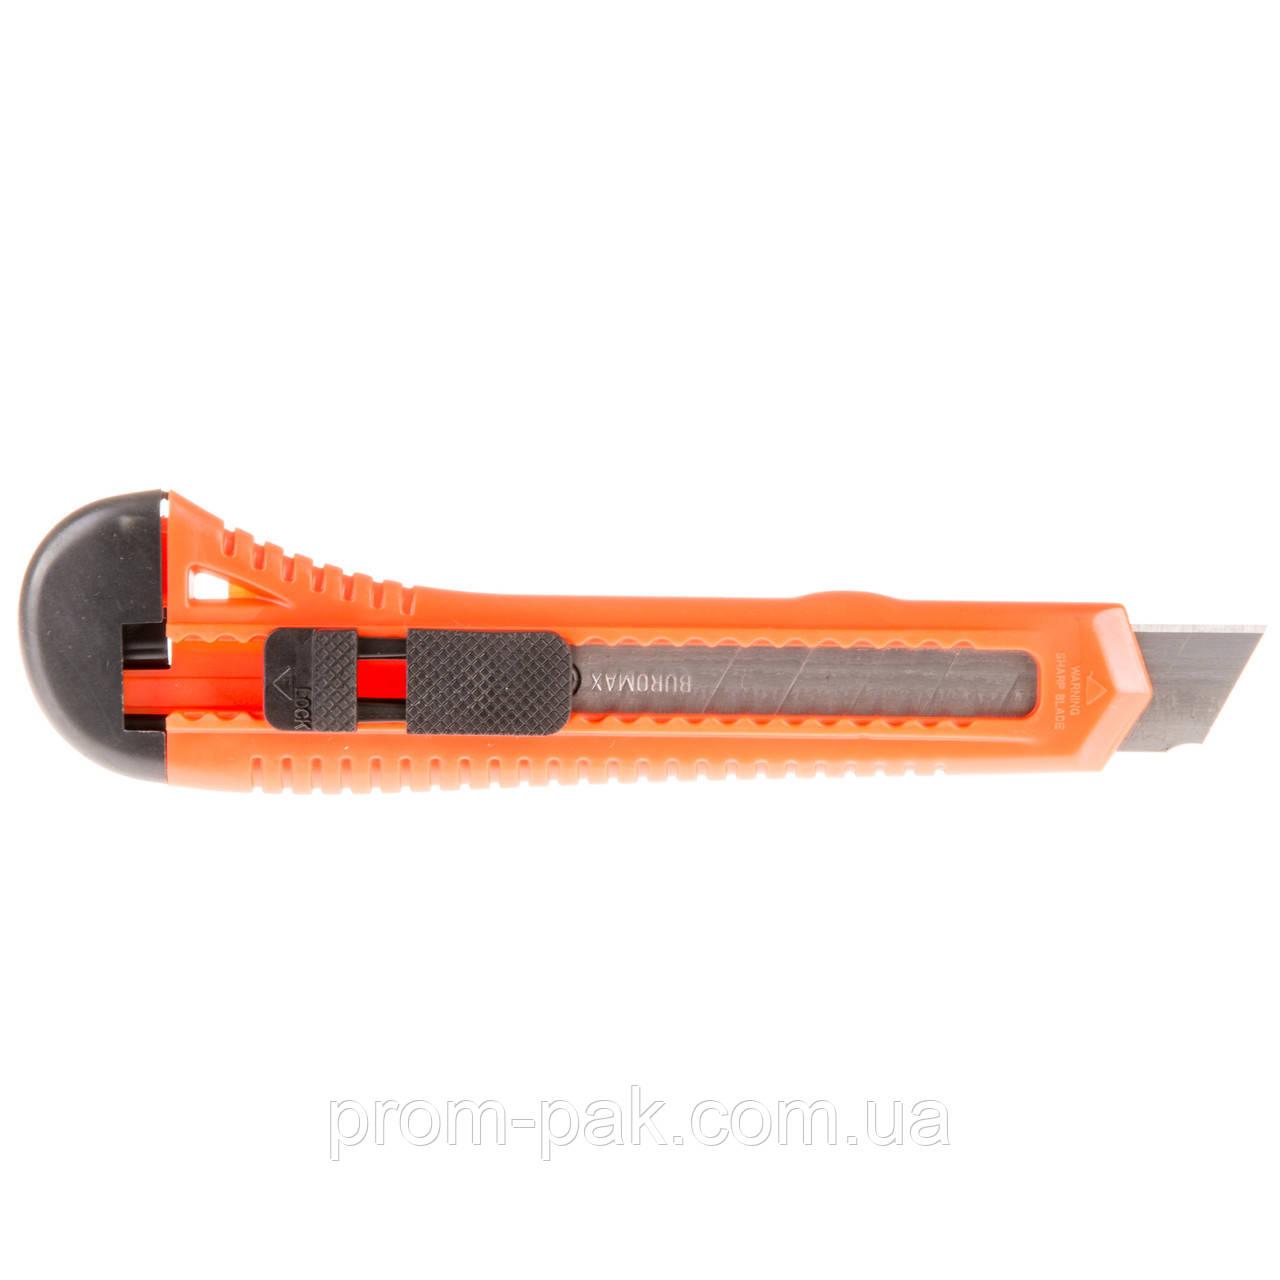 Нож канцелярский большой ВМ 4646